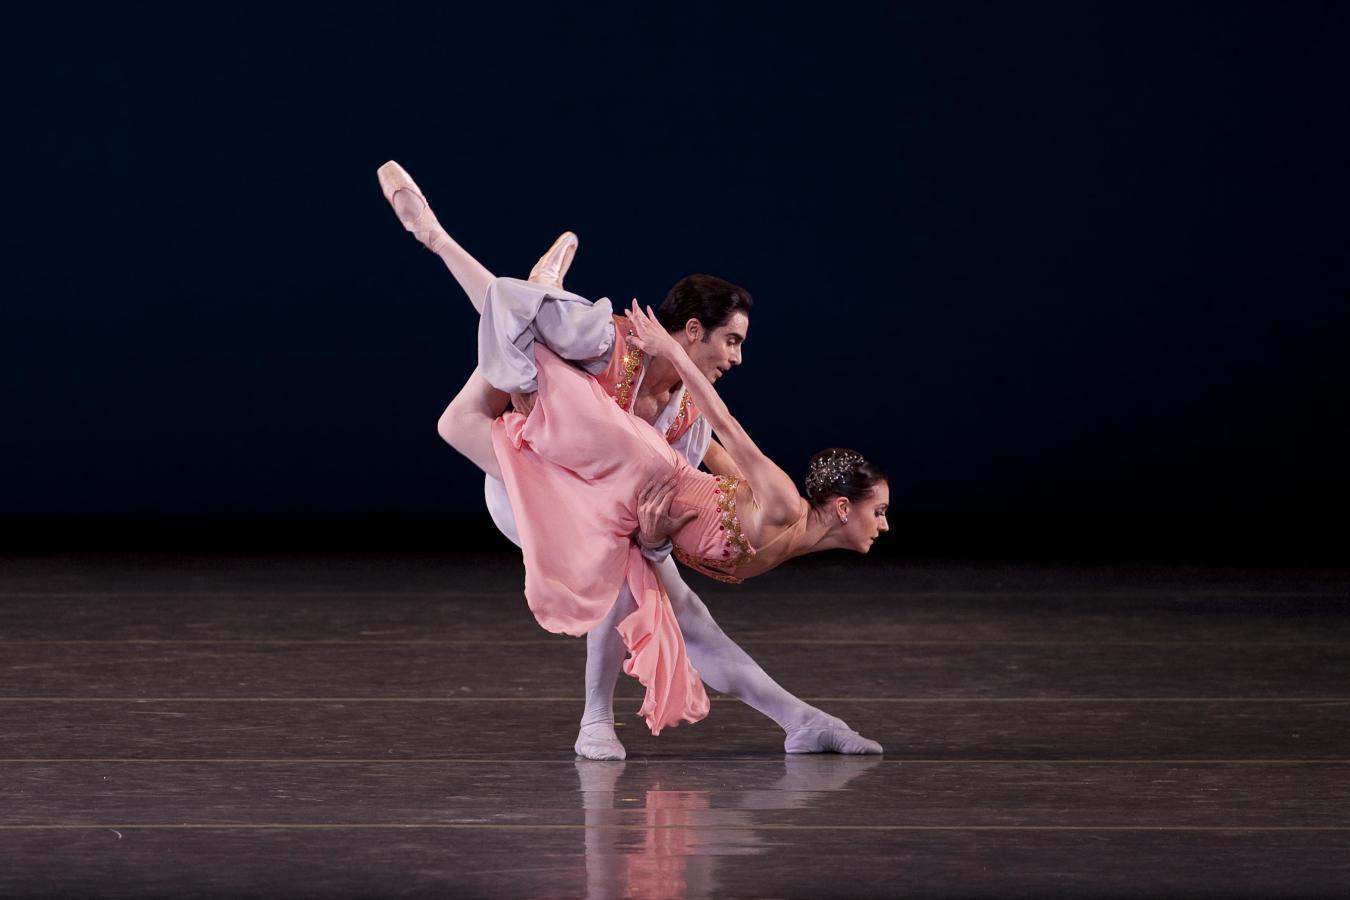 Mary Carmen Catoya and Renato Penteado in Tschaikovsky Pas de Deux. Choreography by George Balanchin